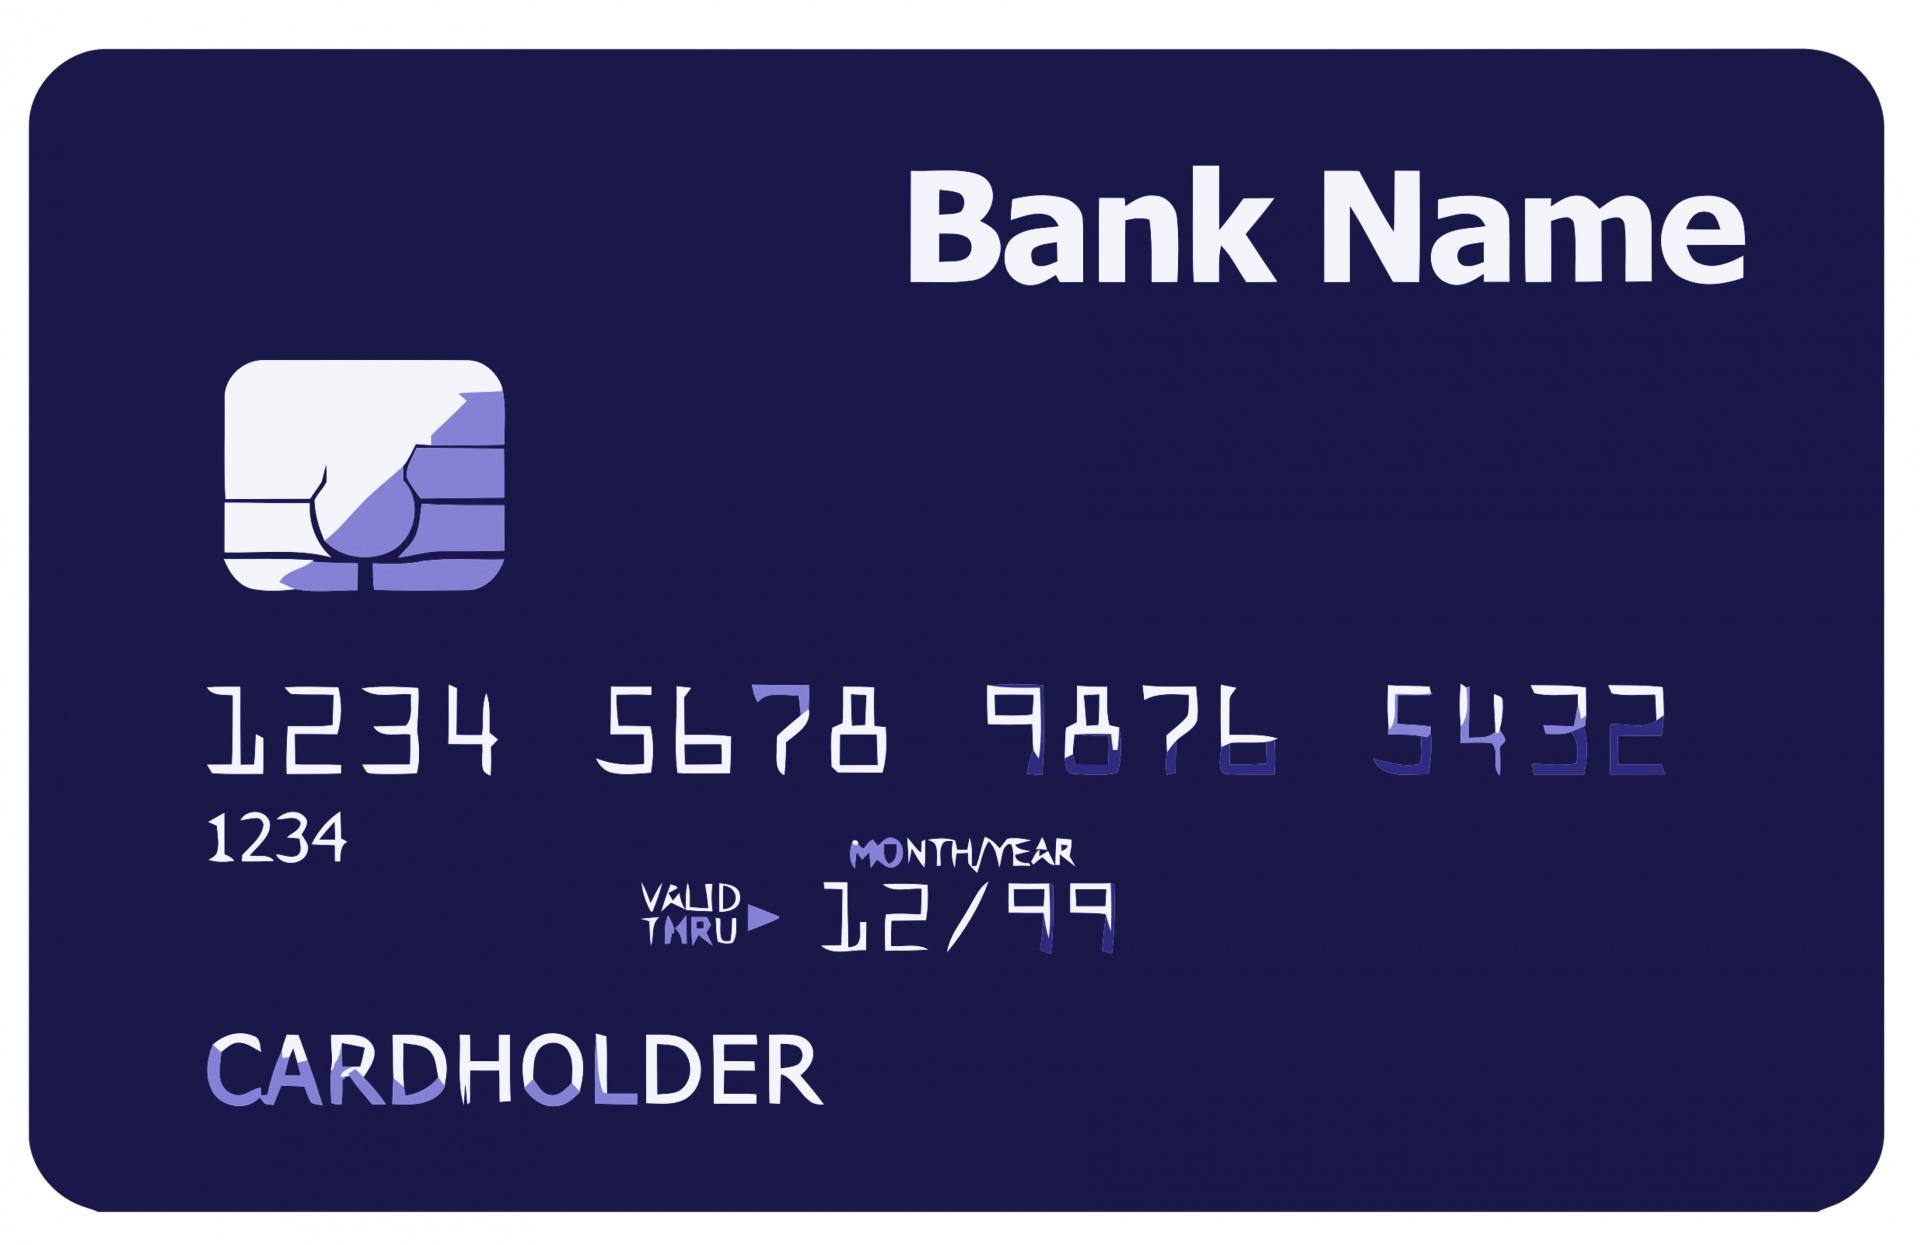 Credit Cards Affect Credit Health